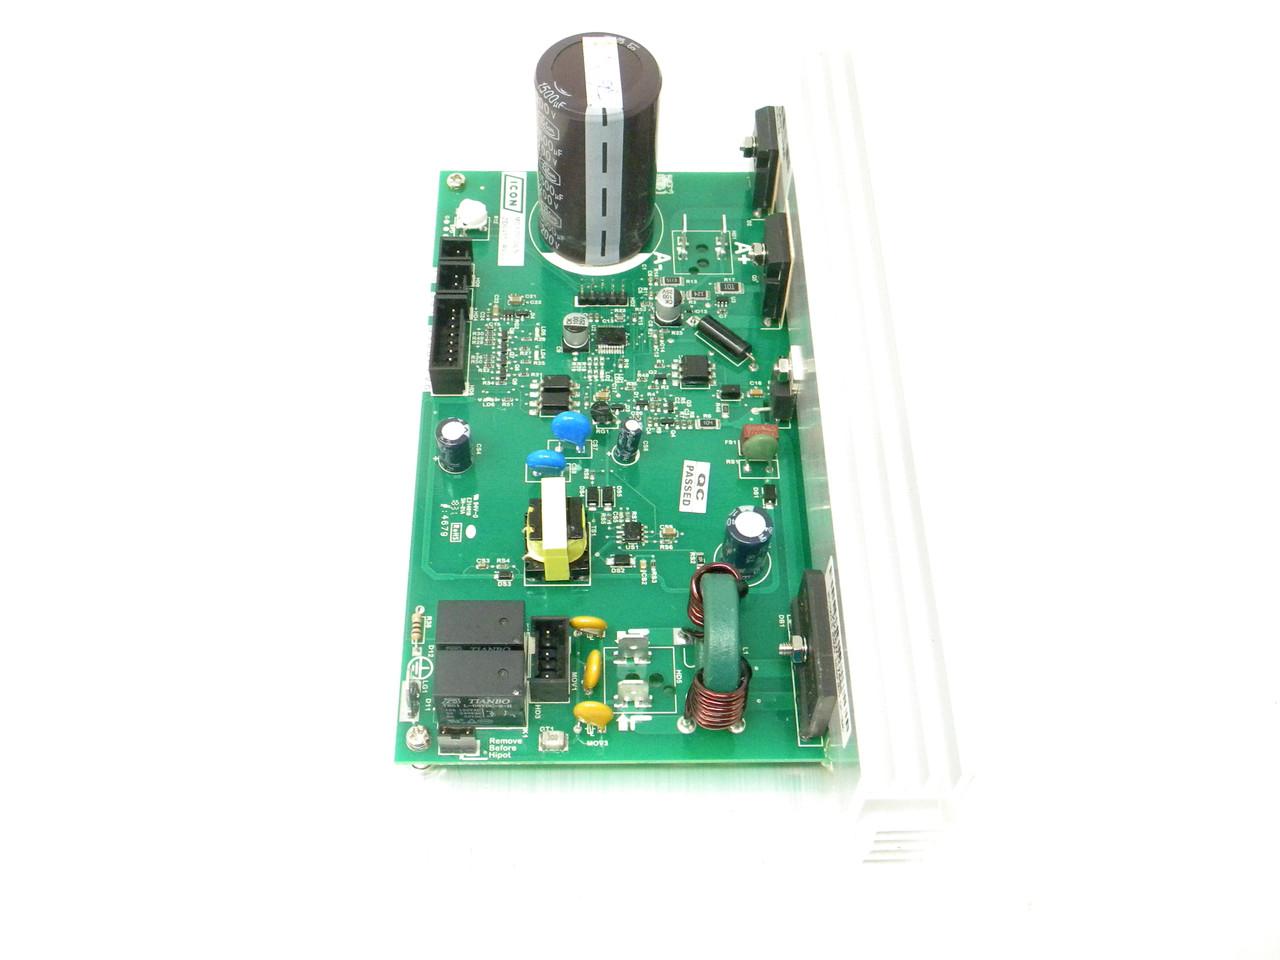 PROFORM Treadmill Model PFTL13116 Motor Controller MC1618DLS Part Number 398074